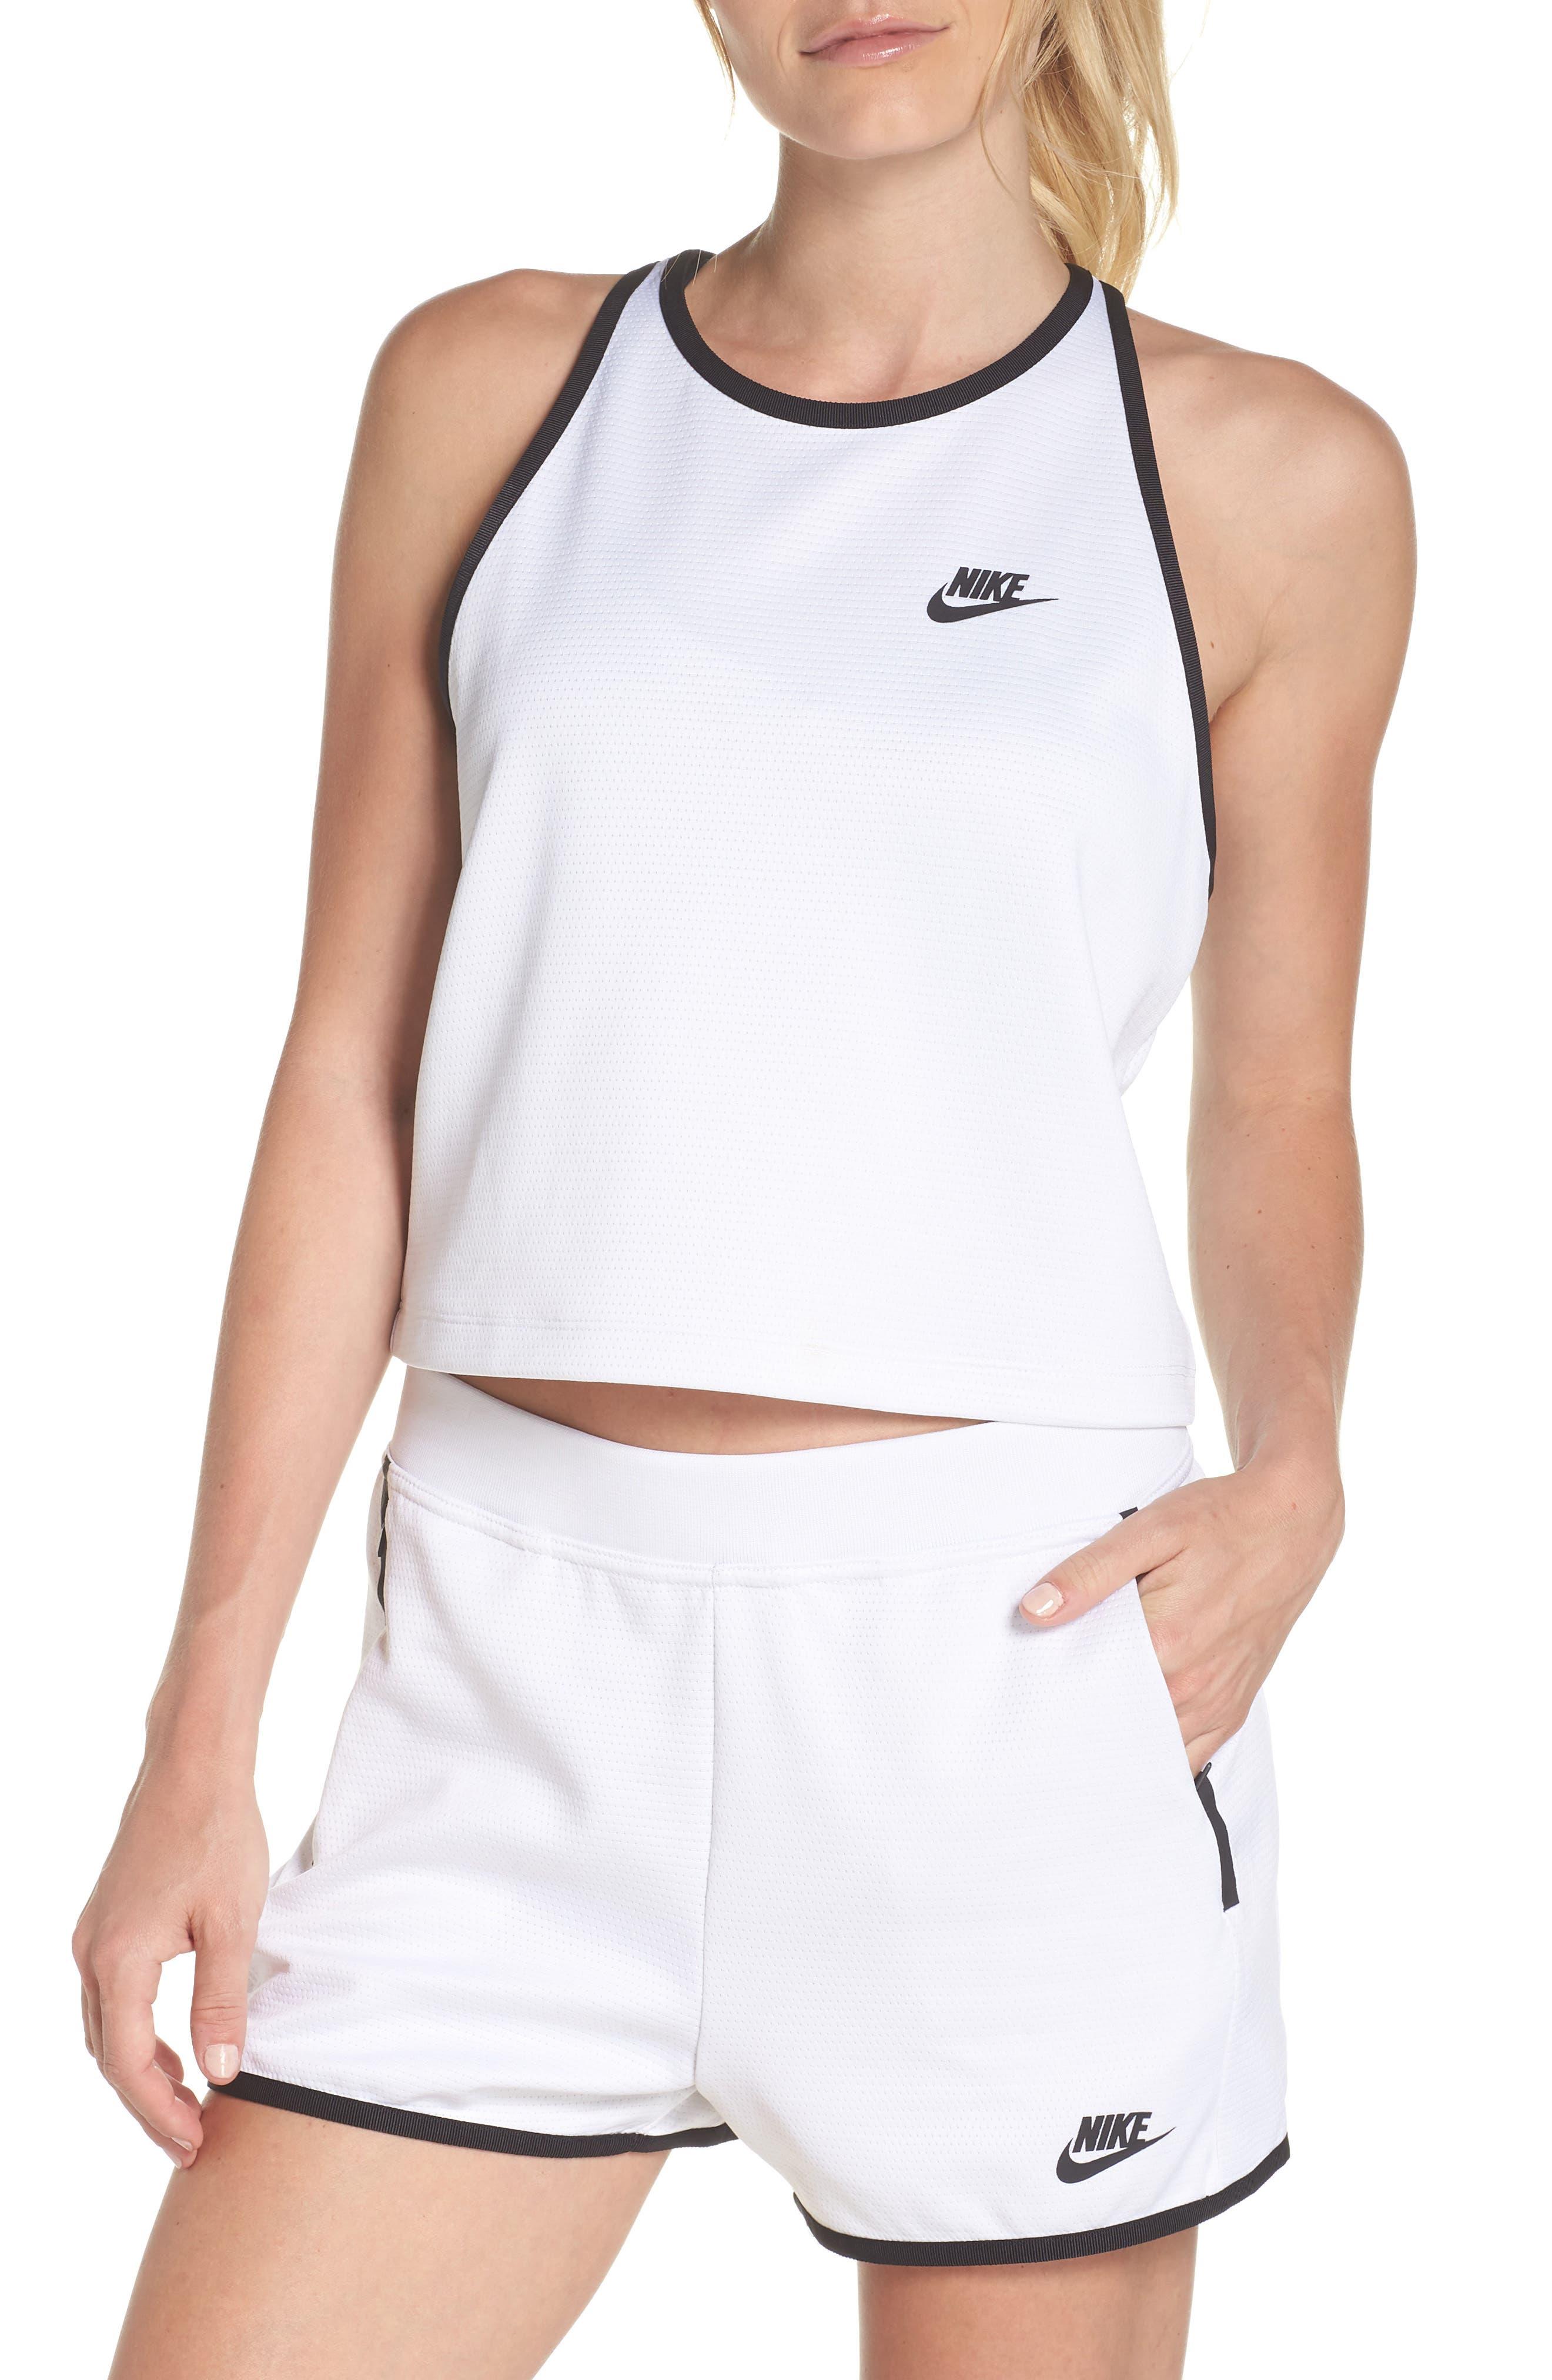 Sportswear Teched Out Tank,                             Main thumbnail 1, color,                             White/ Black